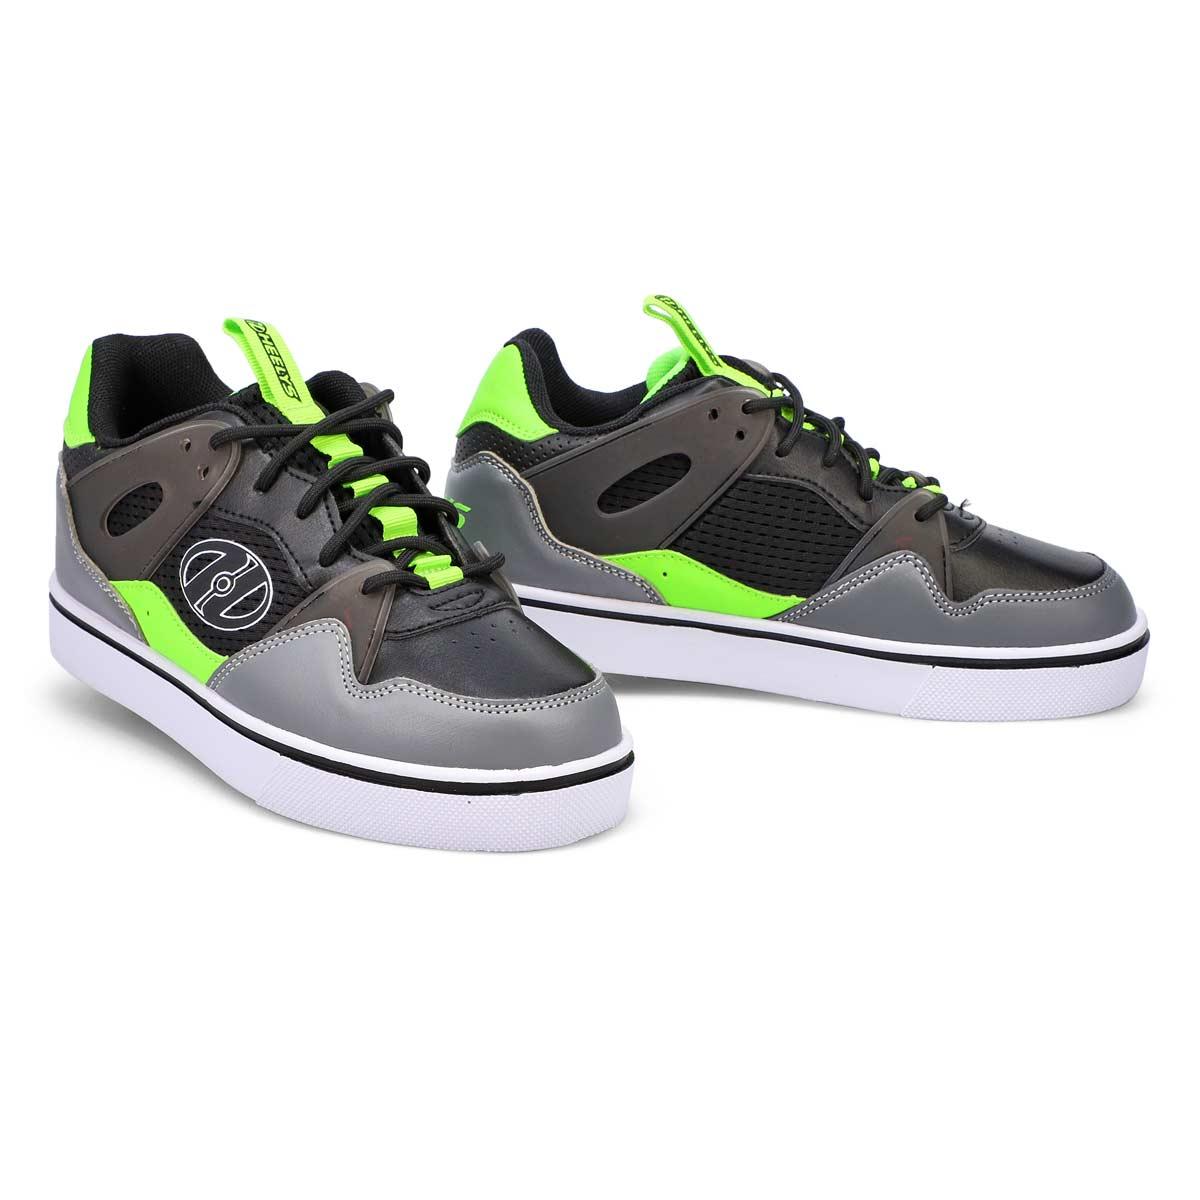 Boys' Ripper Sneakers -Black/Neon Green/Grey